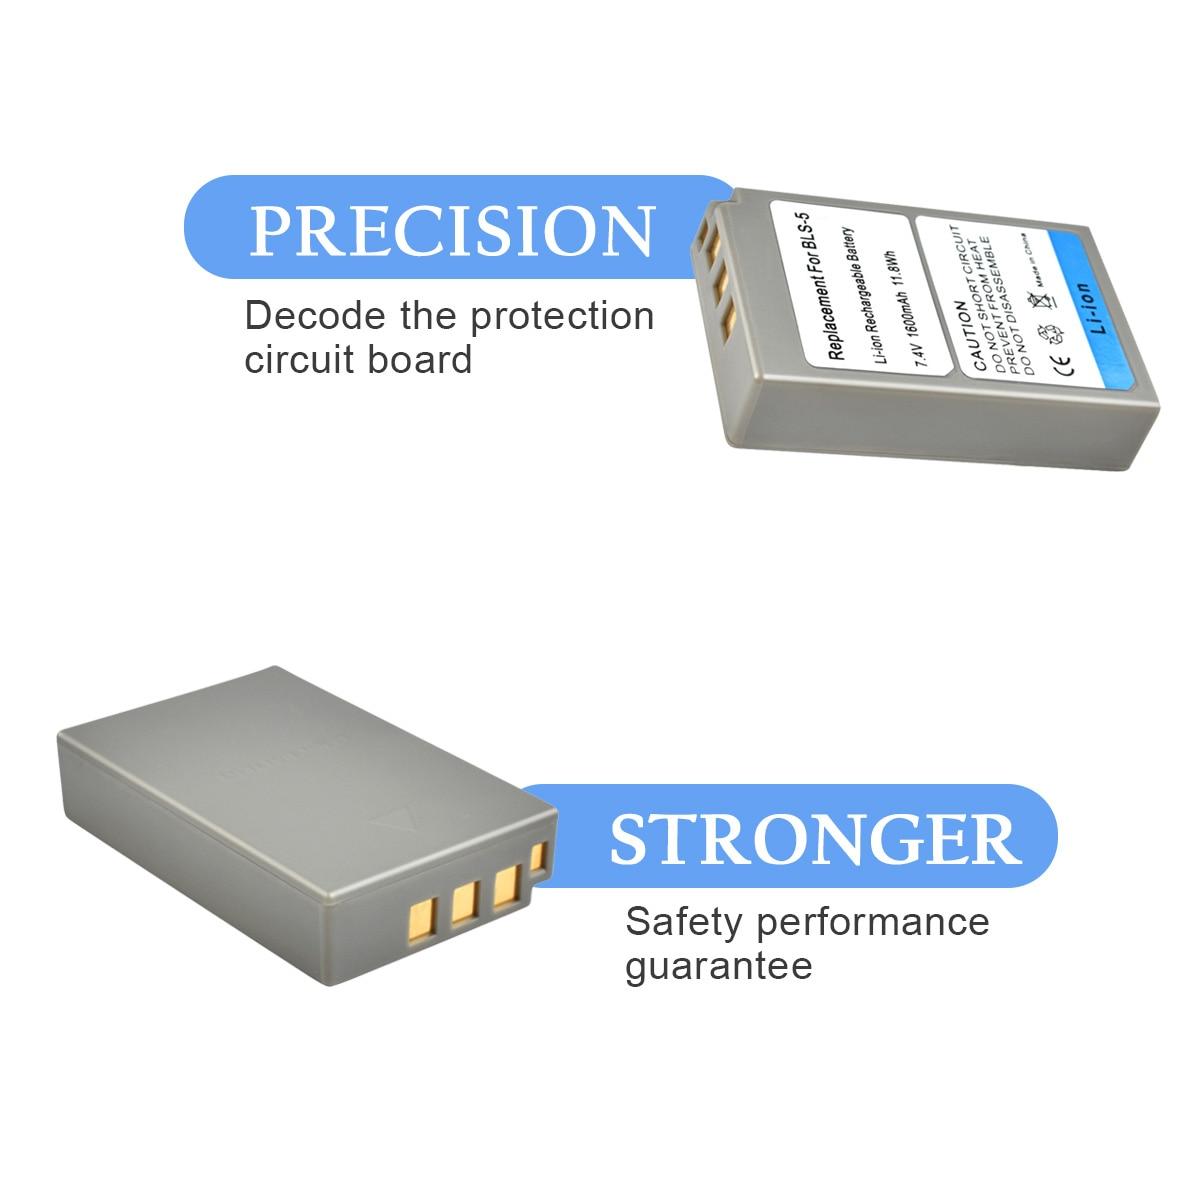 Streng Ohd Original 1600 Mah Bln-1 Ps-bln1 Bln 1 Digital Kamera Batterie Für Olympus E-m5 Em5 Omd Om-d Stromquelle Digital Batterien